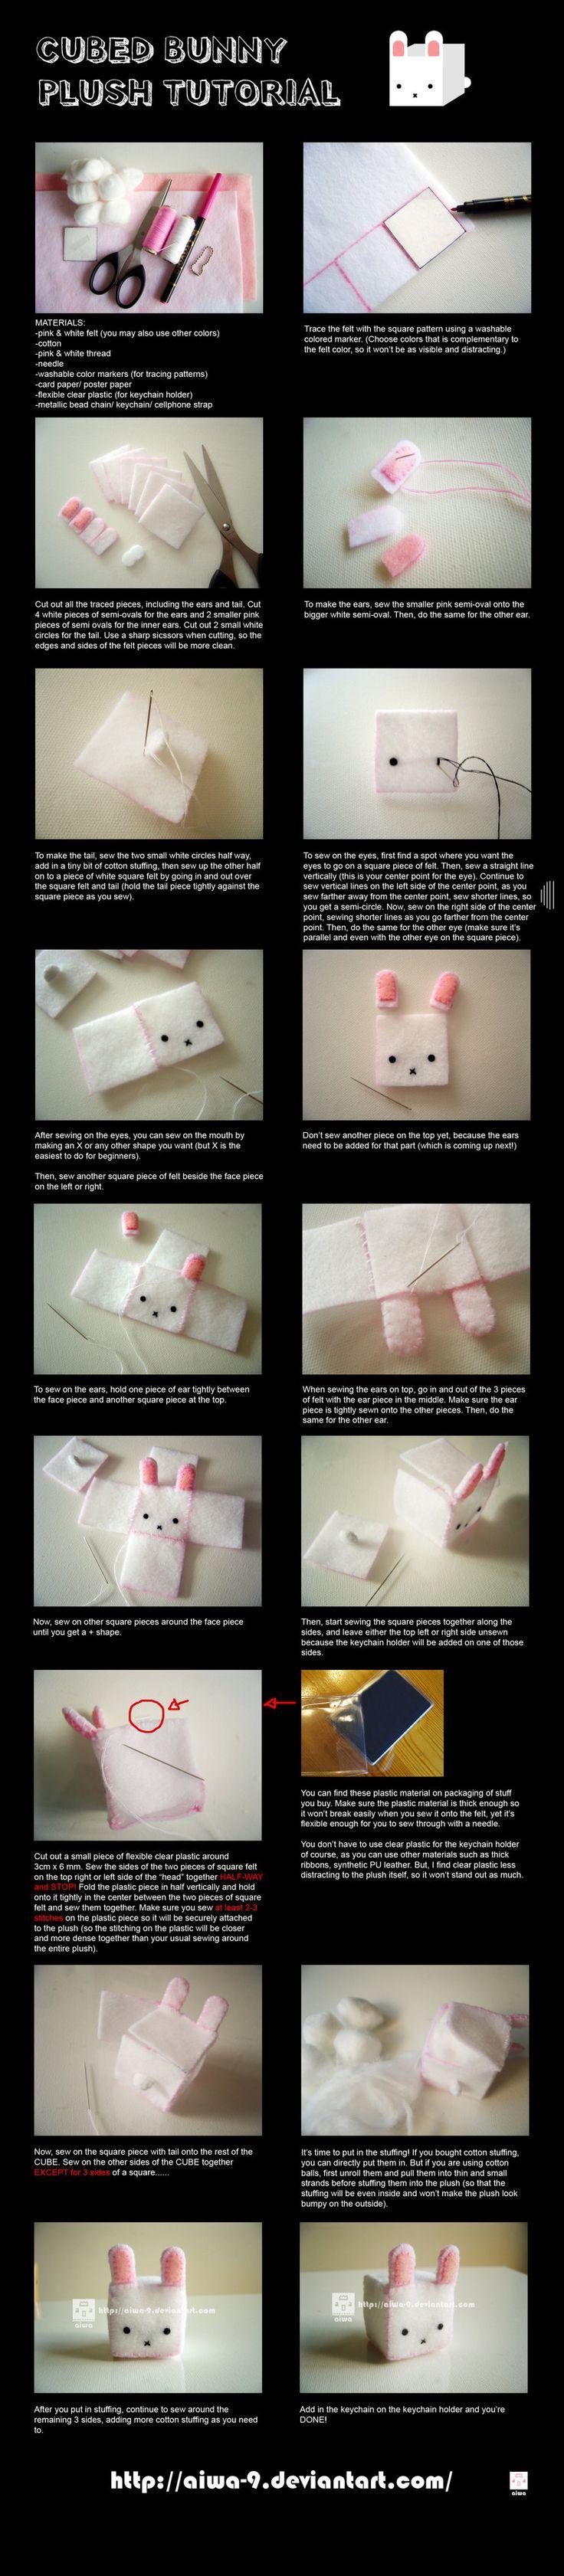 CUBED bunny plush tutorial by aiwa-9.deviantart.com on @deviantART